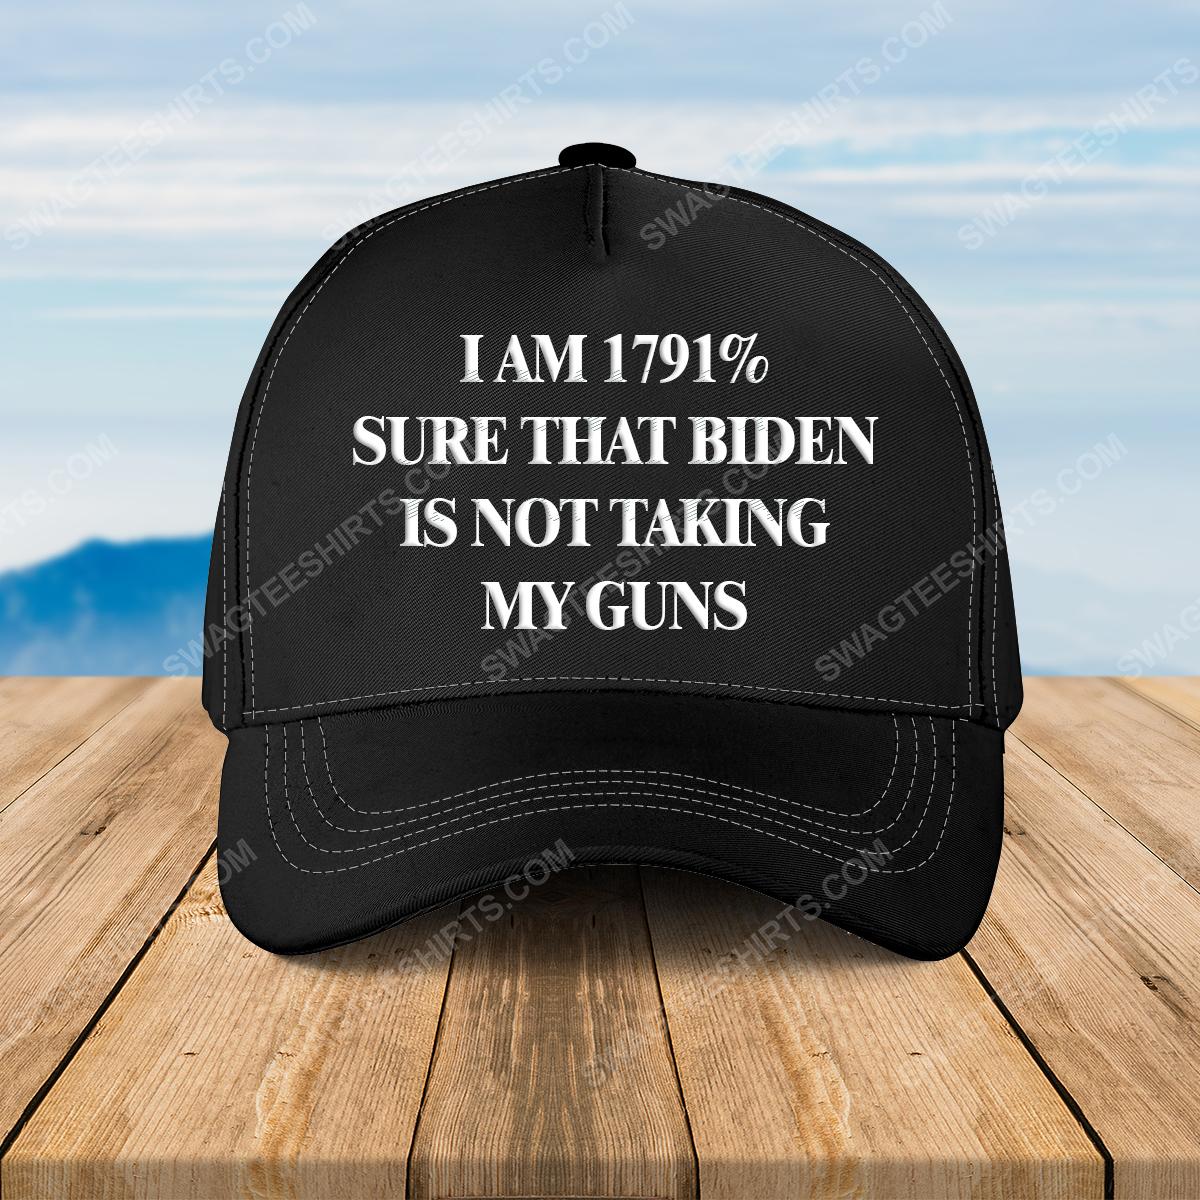 I am 1791 sure that biden is not taking my guns full print classic hat 1 - Copy (2)